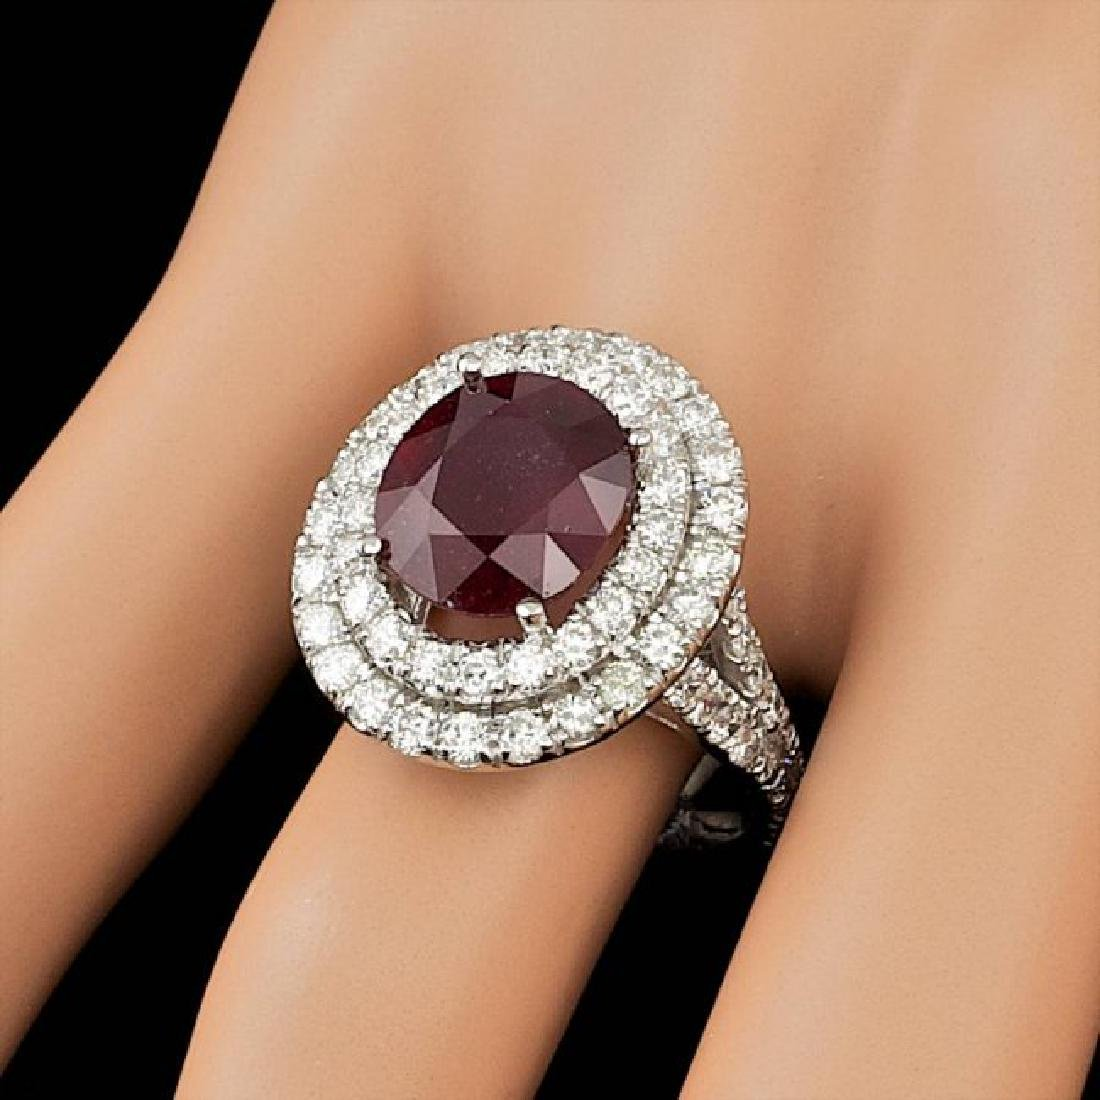 14k White Gold 5.50ct Ruby 2.15ct Diamond Ring - 4